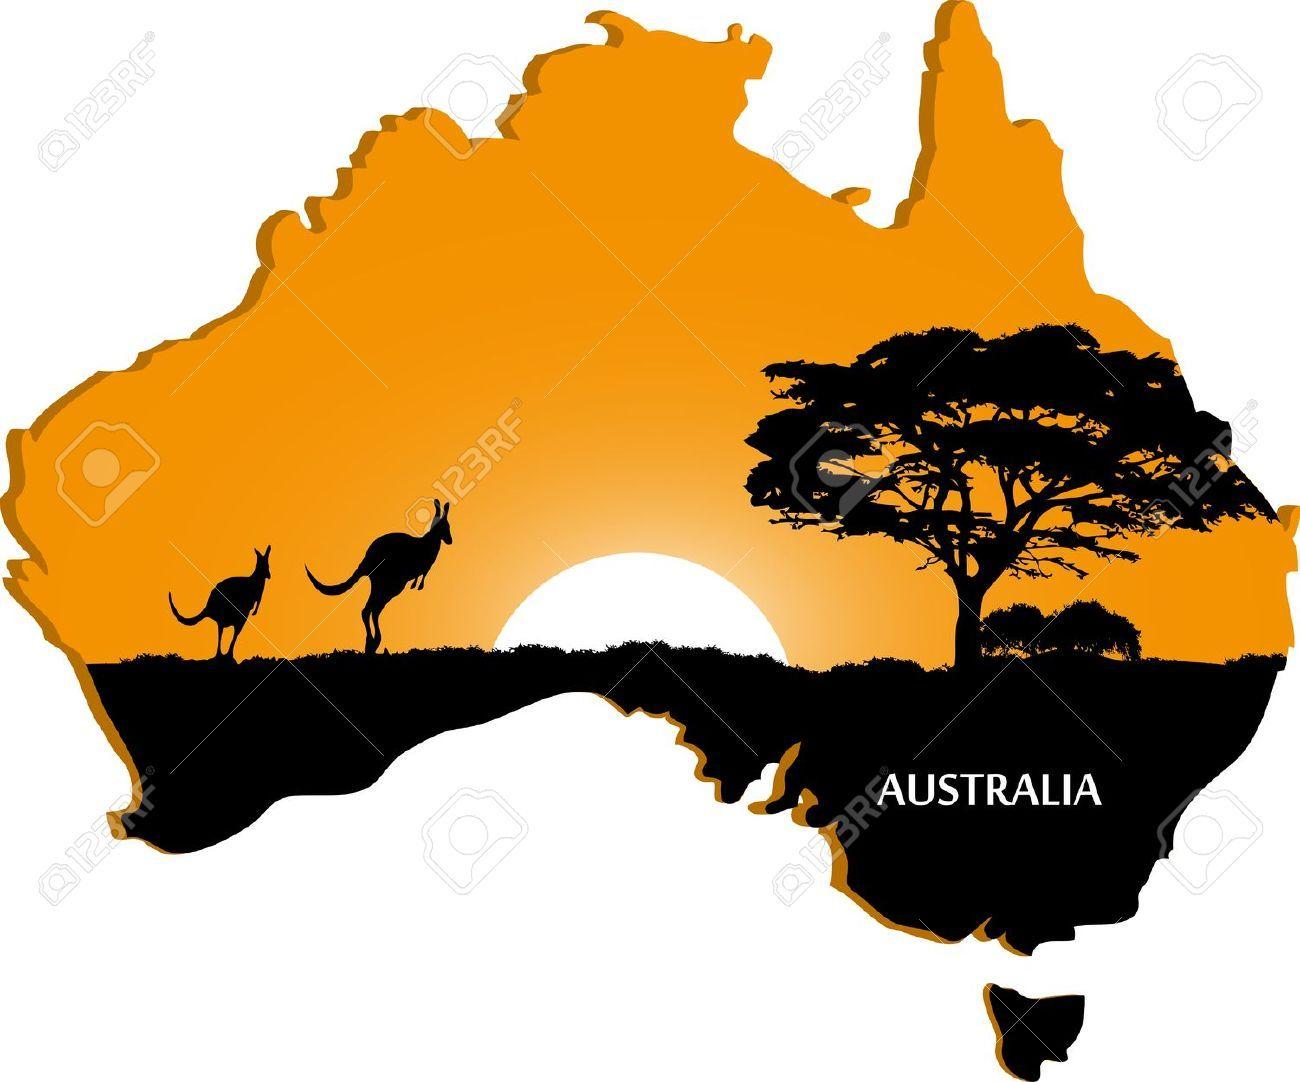 Australia clipart silhouette. Australian continent royalty free